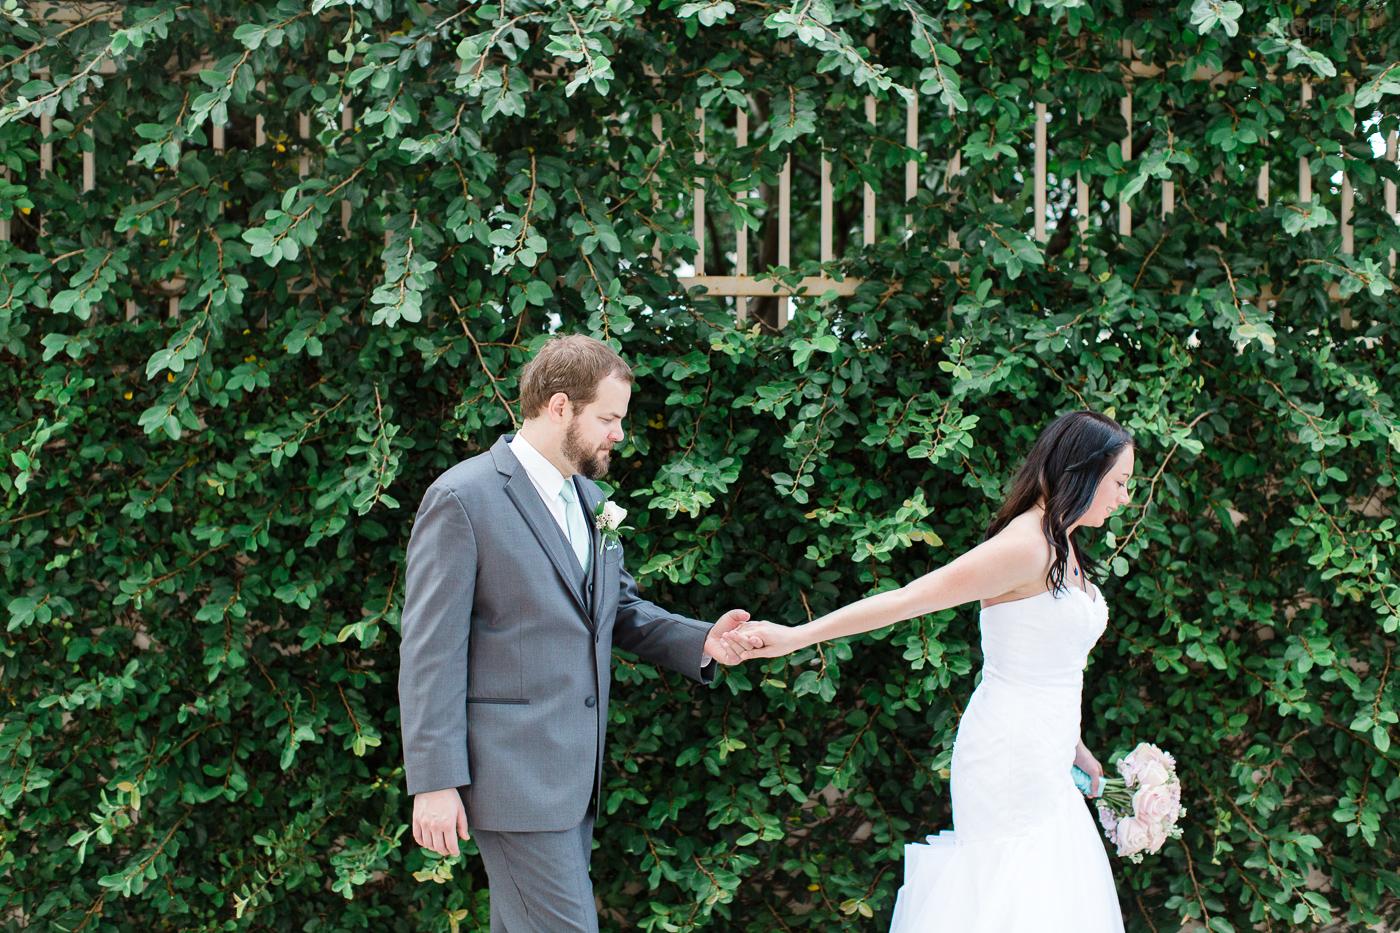 downtown-orlando-wedding-photographer-74.jpg